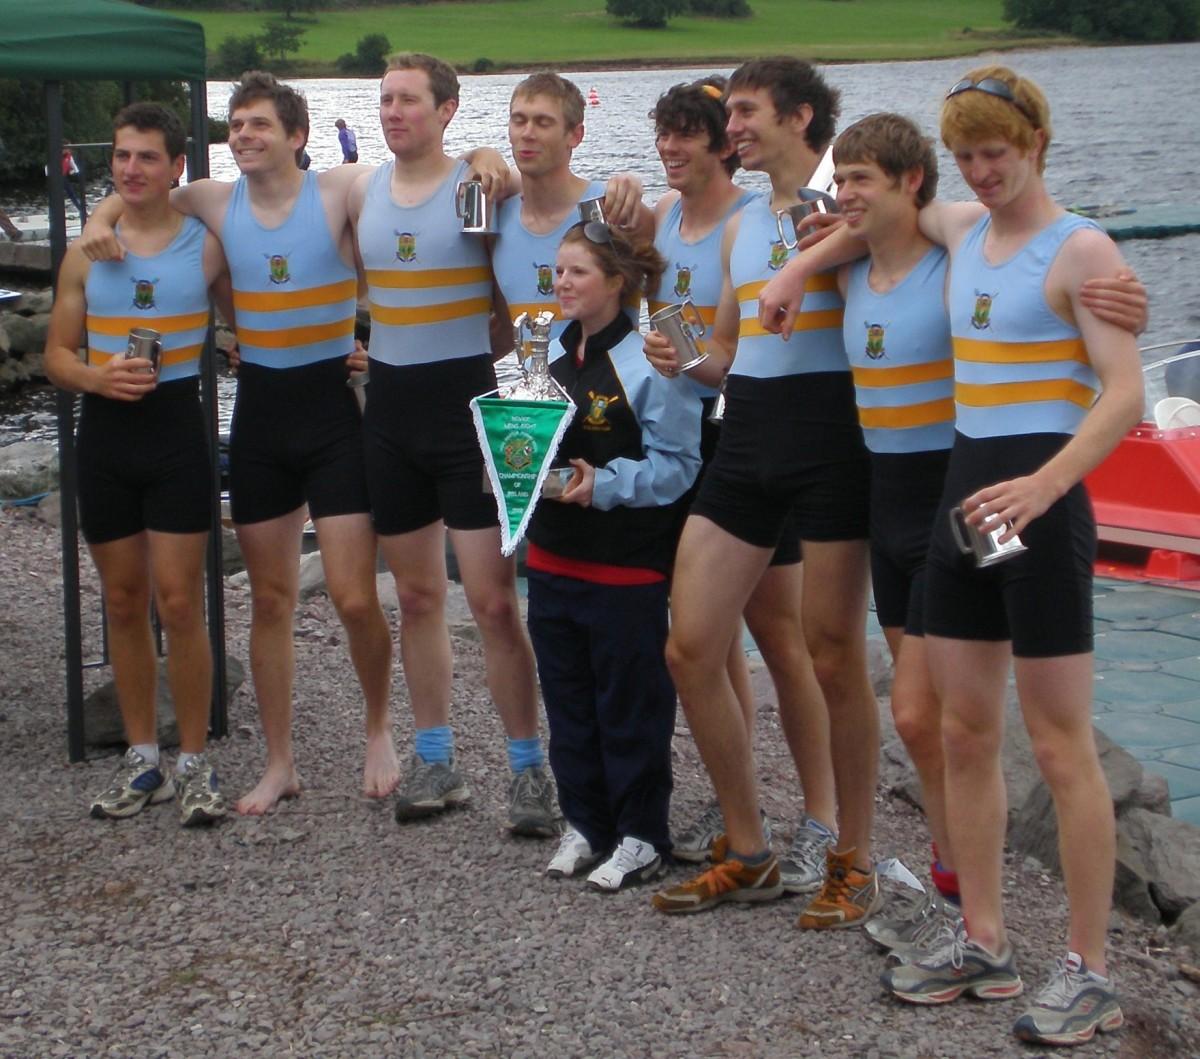 UCD Mens Novice 8+, National Champions 2008